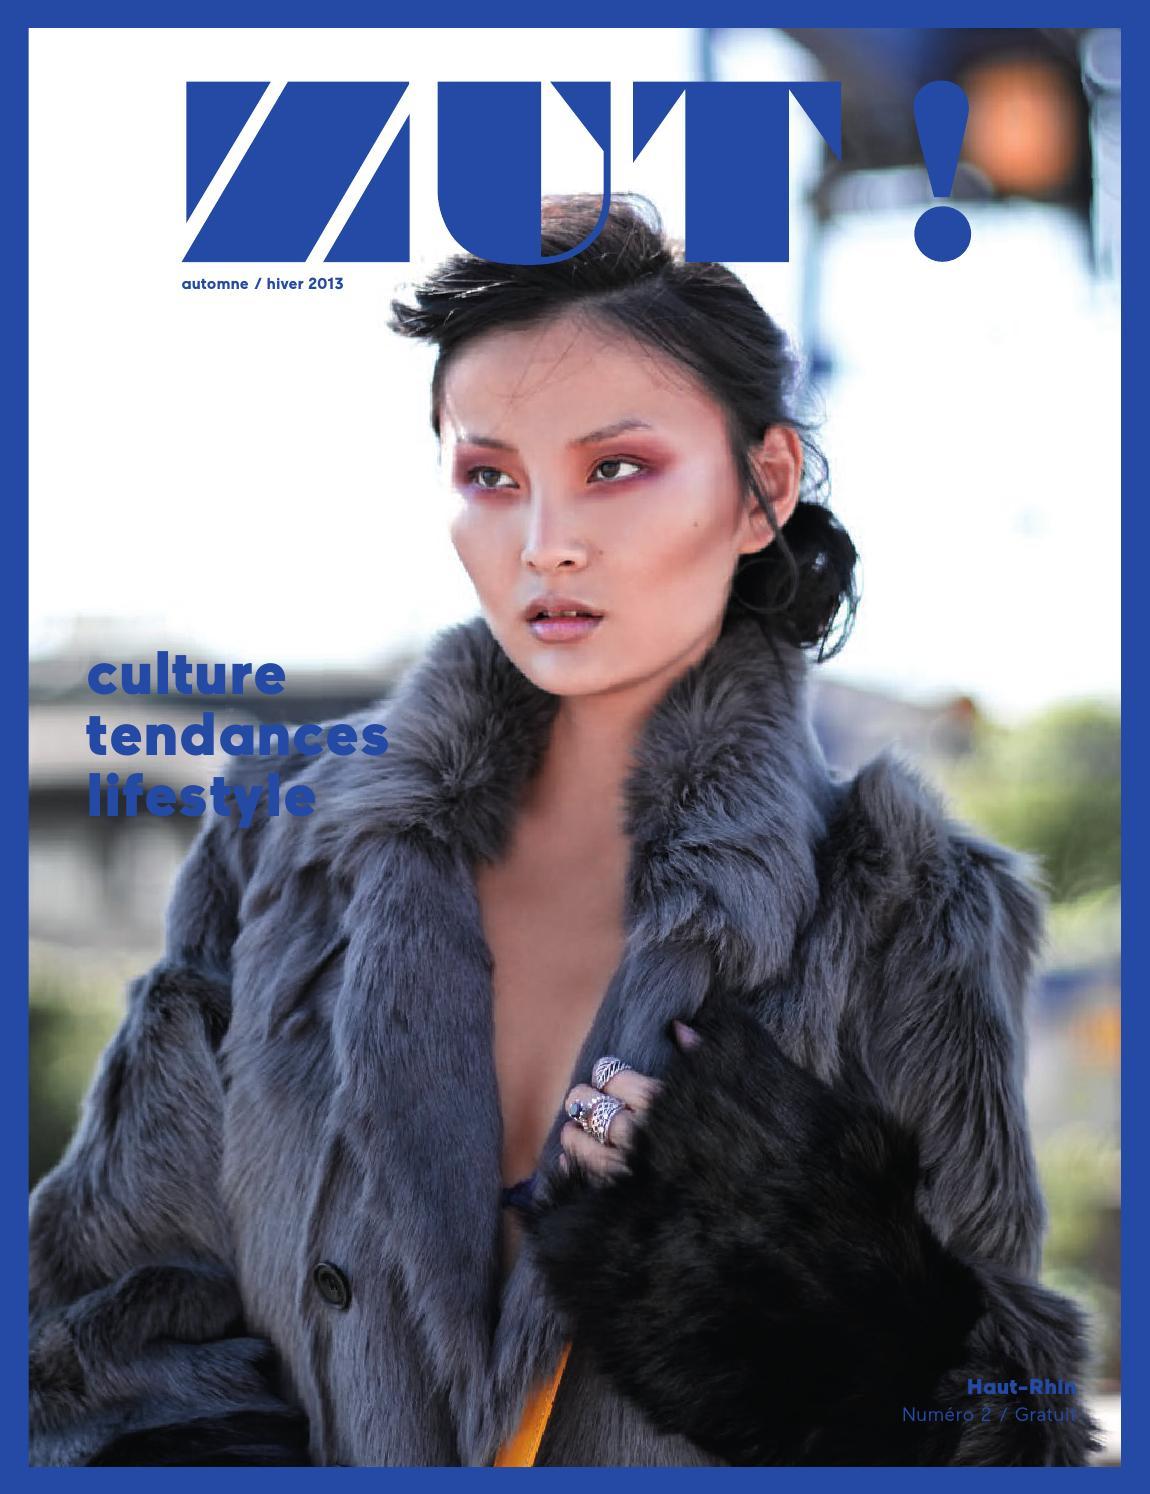 Issuu By Zut Magazine Haut Rhin 02 exdCQrBoWE